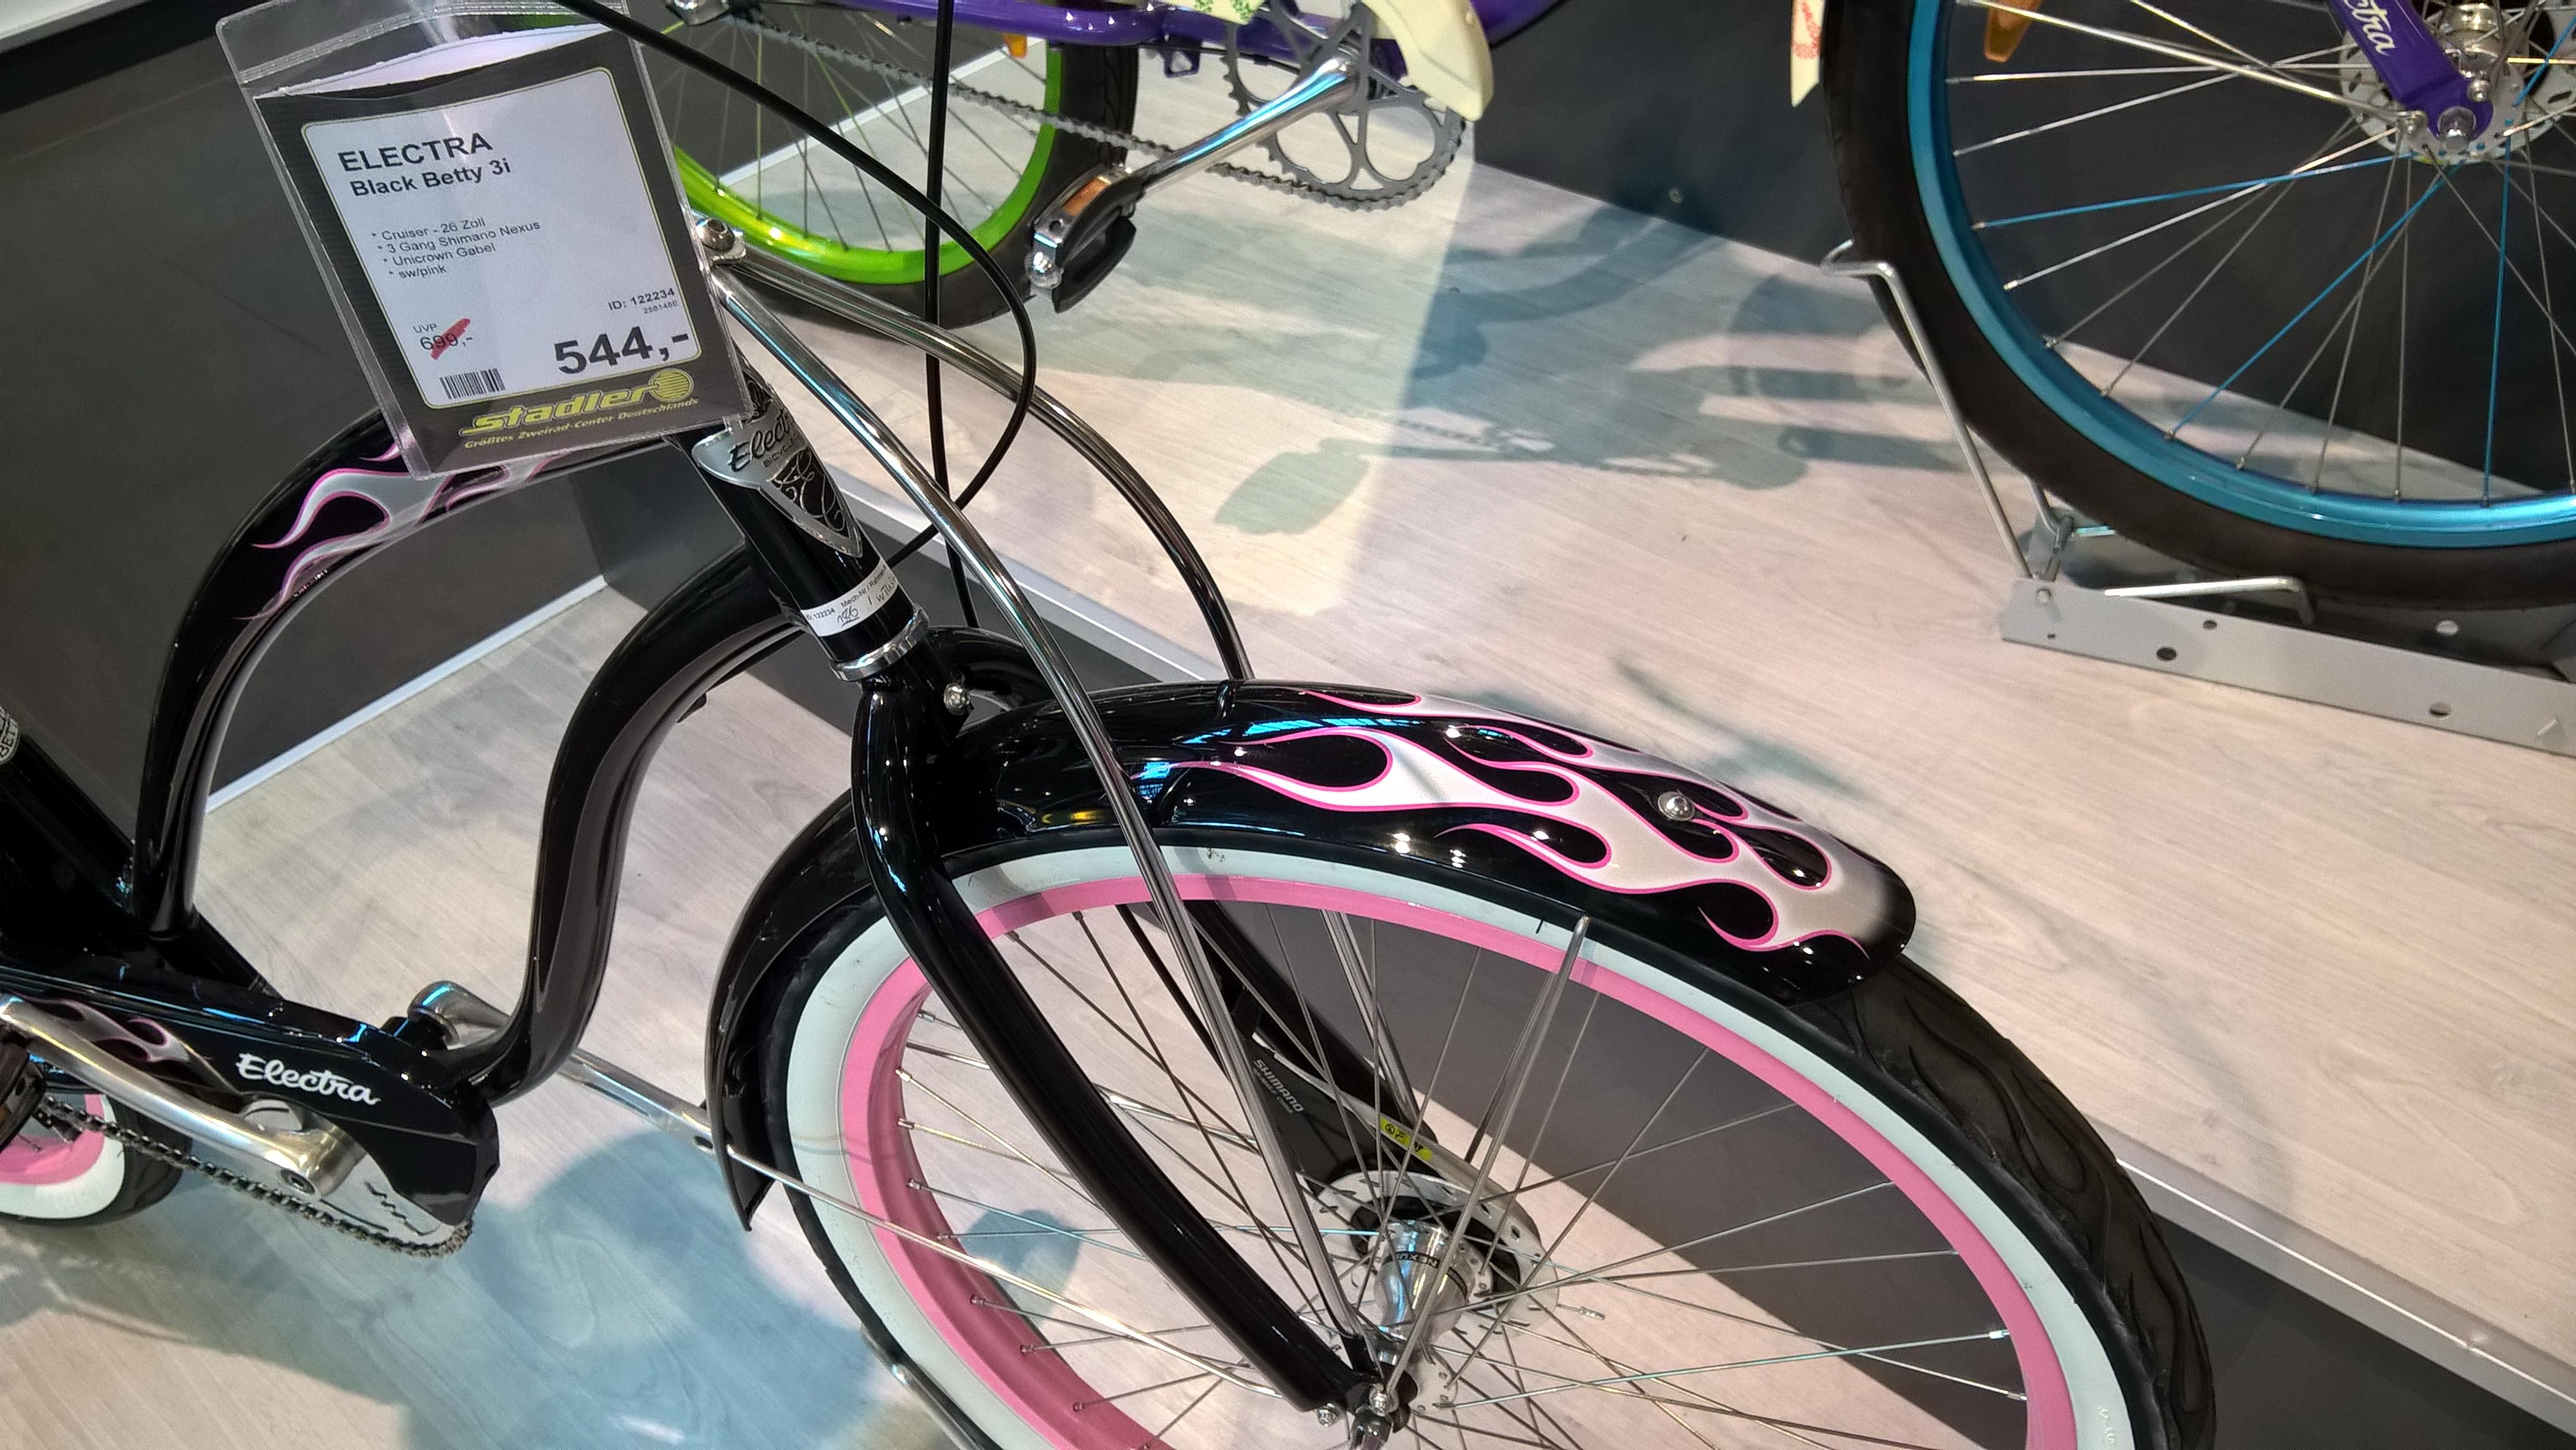 16-07-20-Electra-Bike-WP 20160711 14 47 29 Pro.jpg